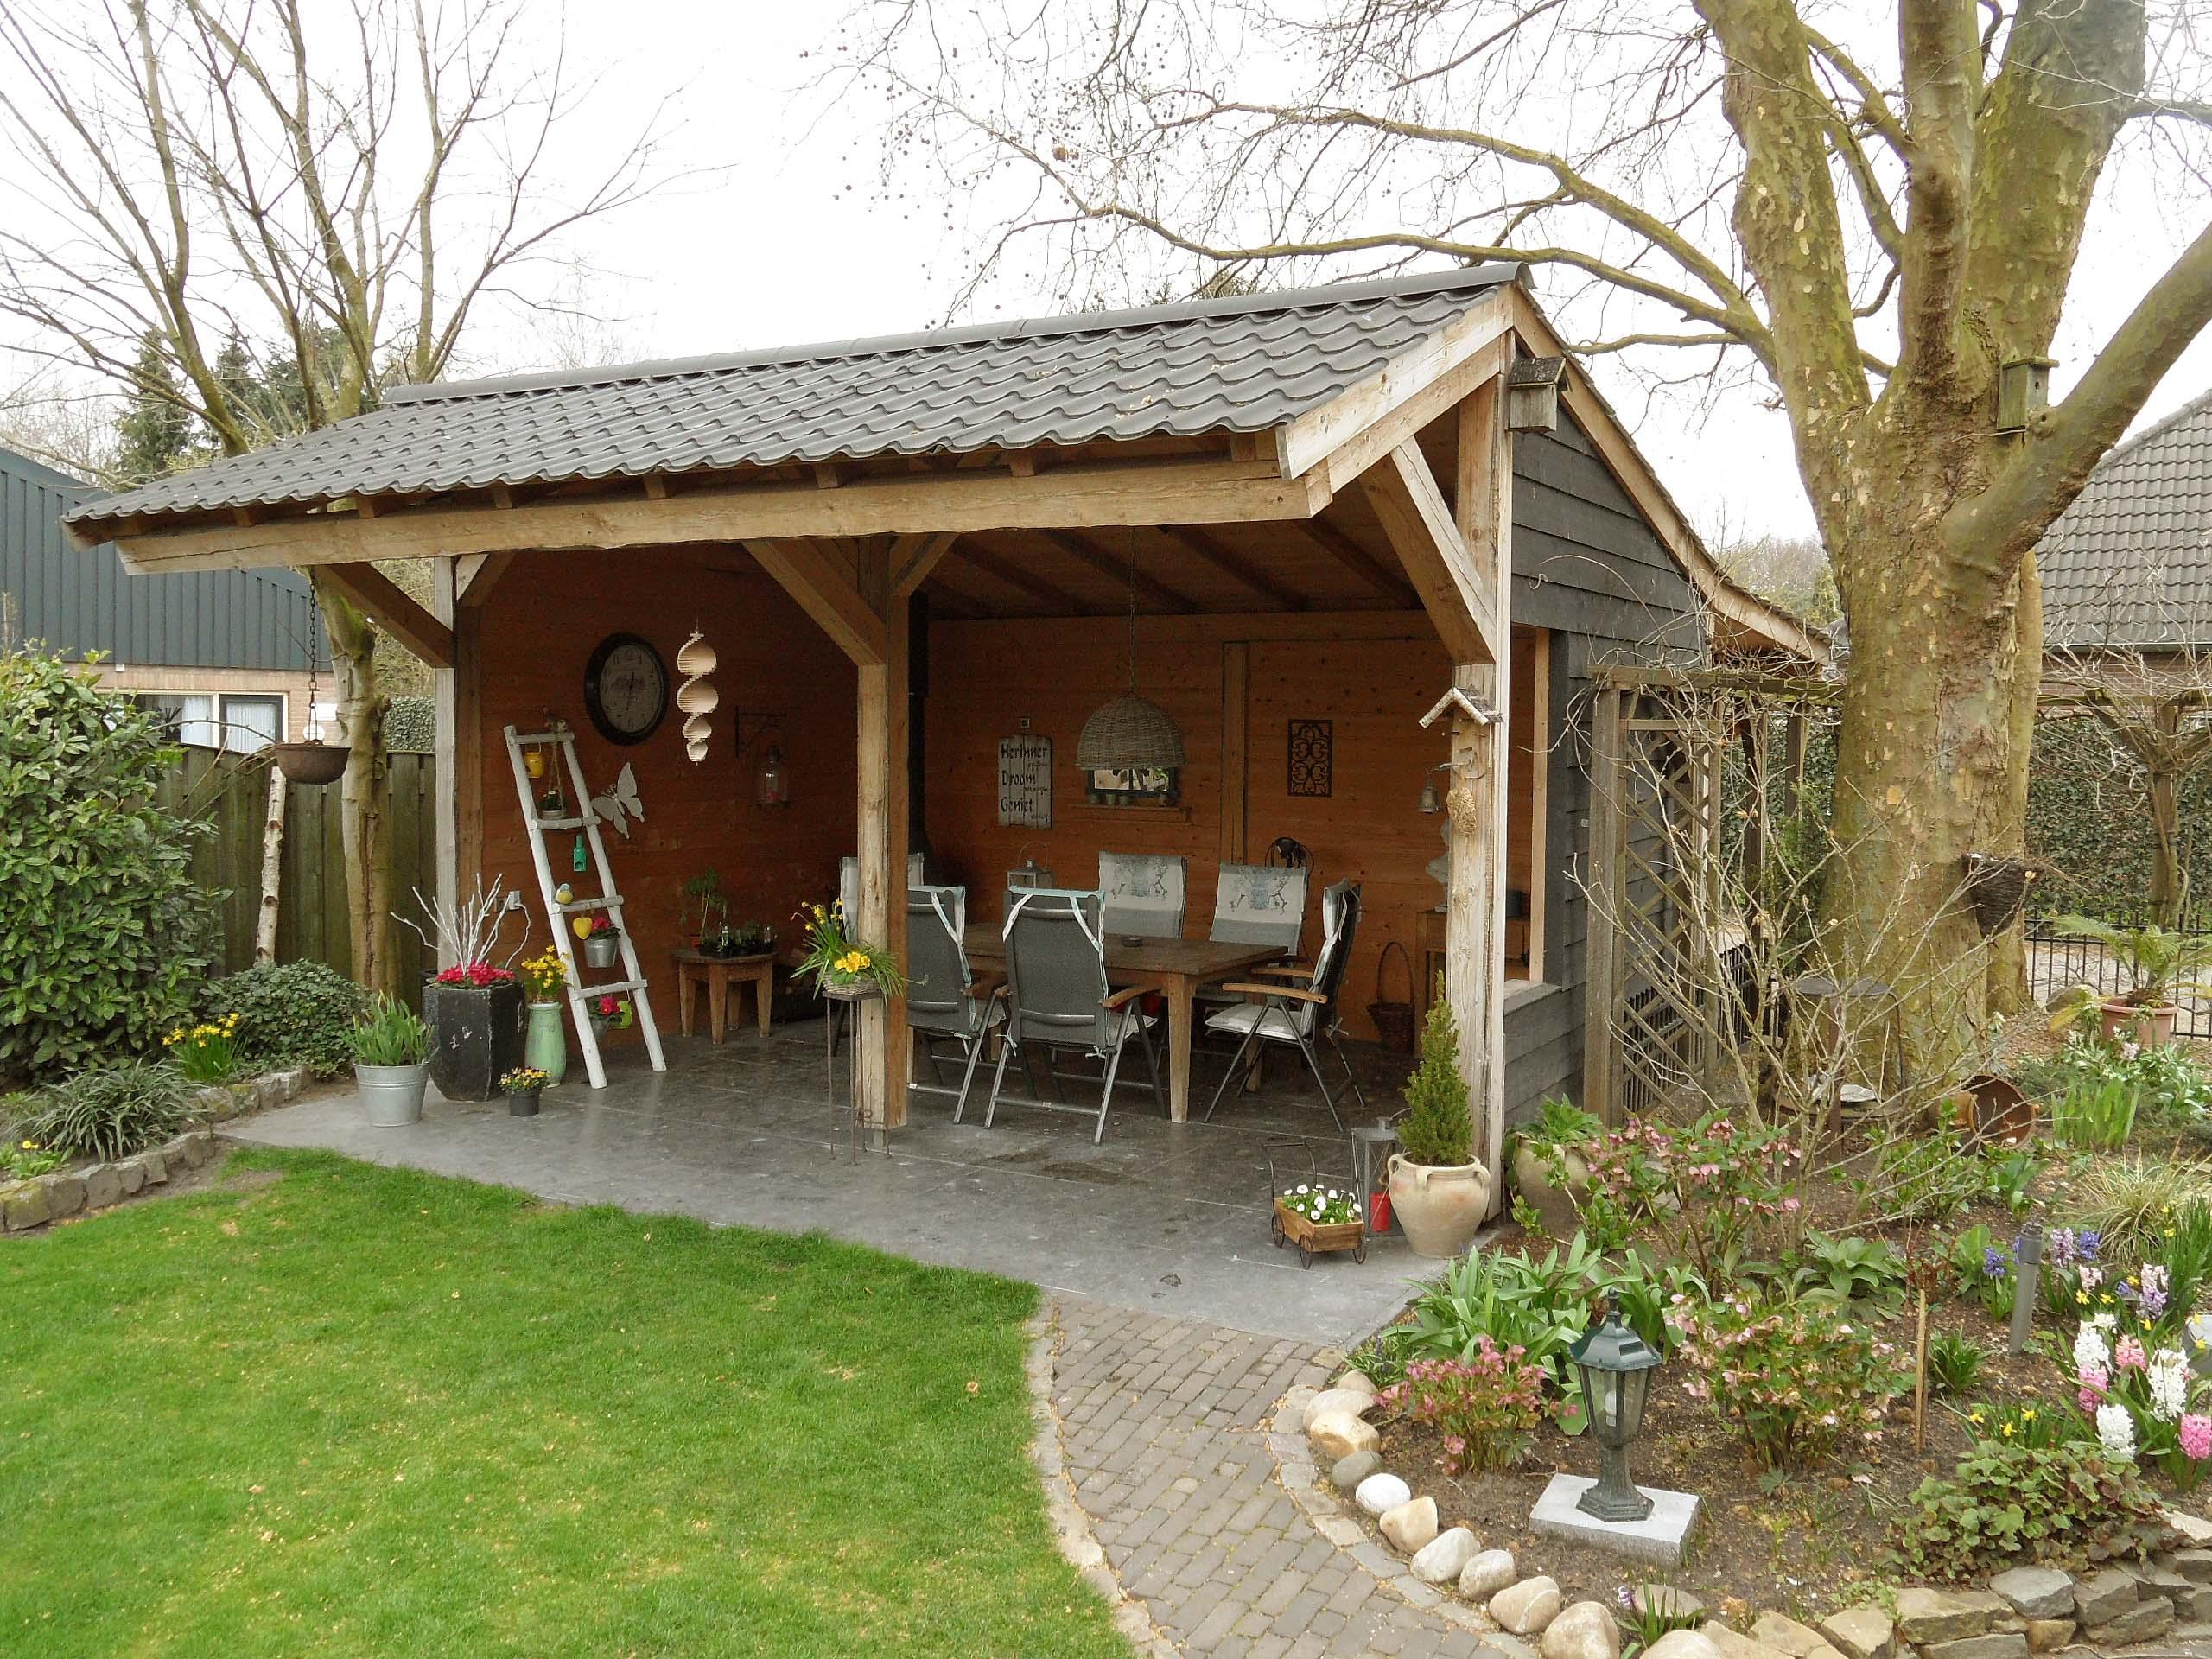 Tuinhuis met overkapping Volkel